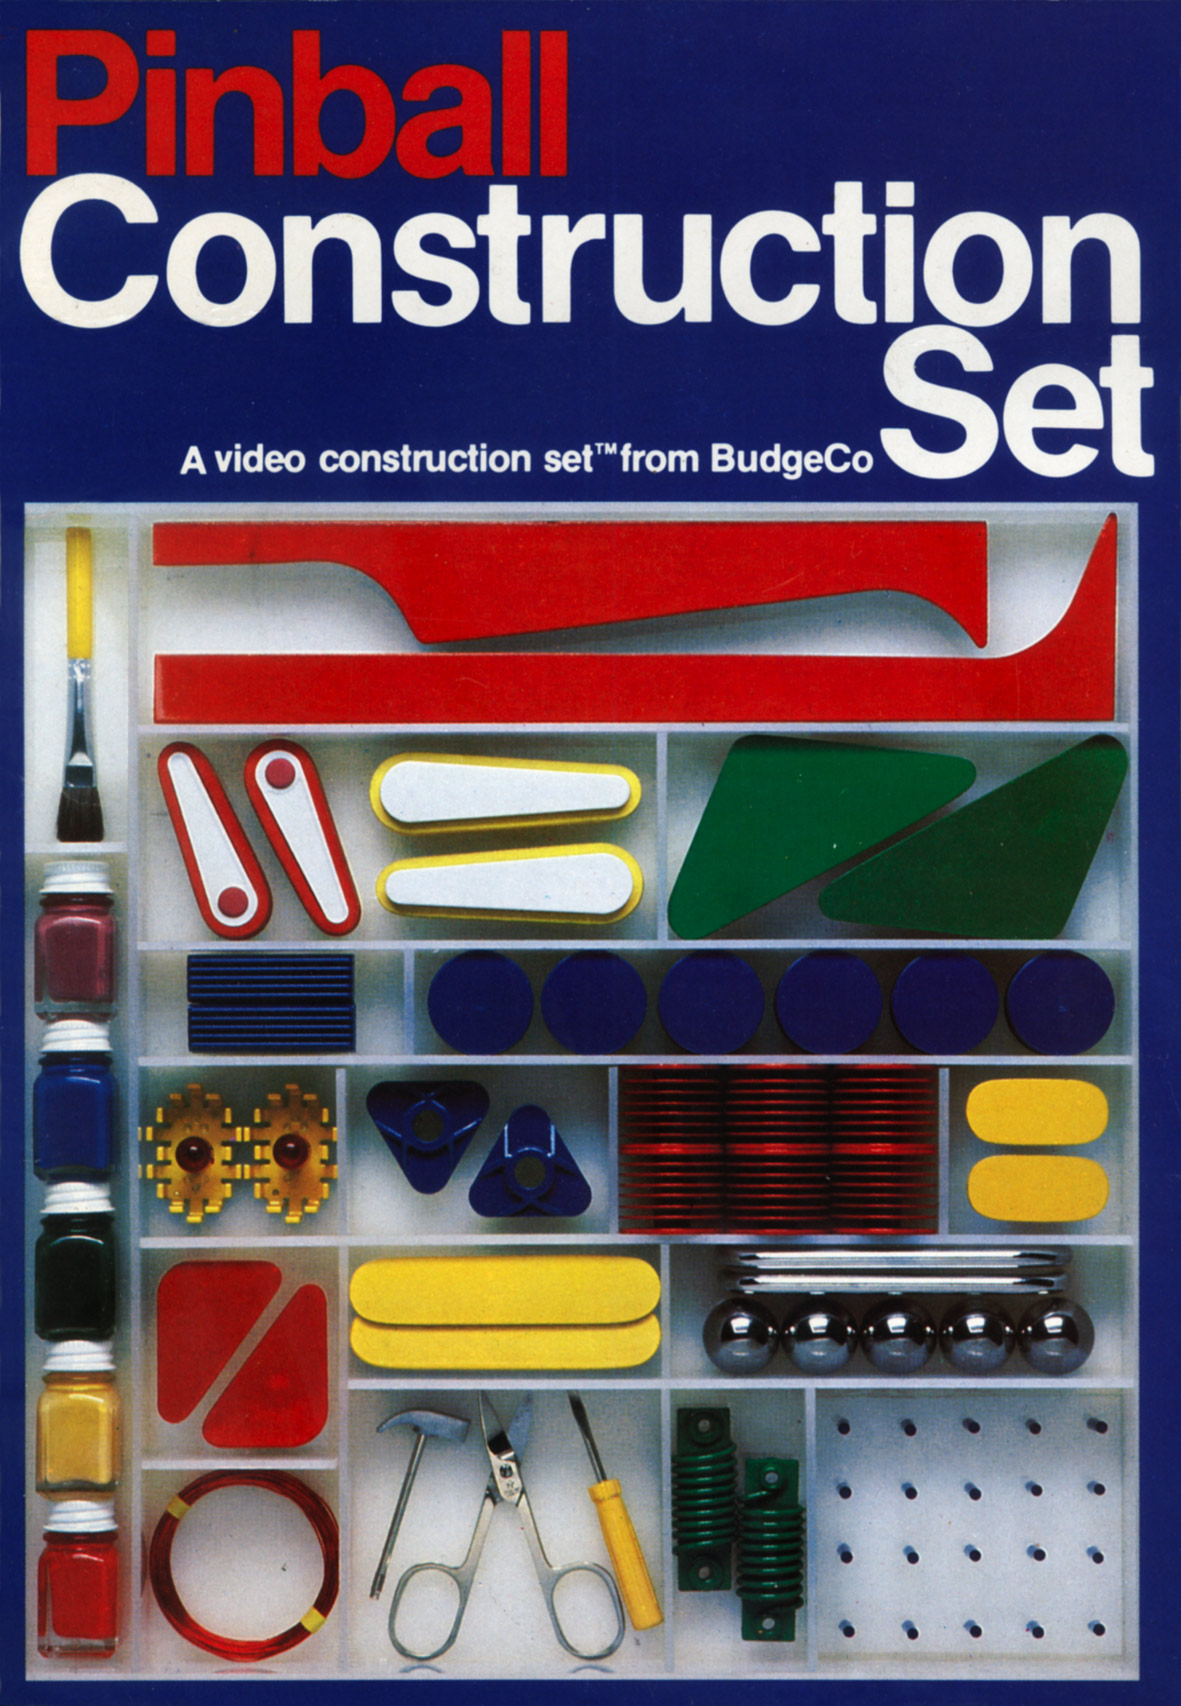 Pinball construction set - The Original Pinball Construction Set Box Art Featuring Pieces Of The Pinball Machine That Budge